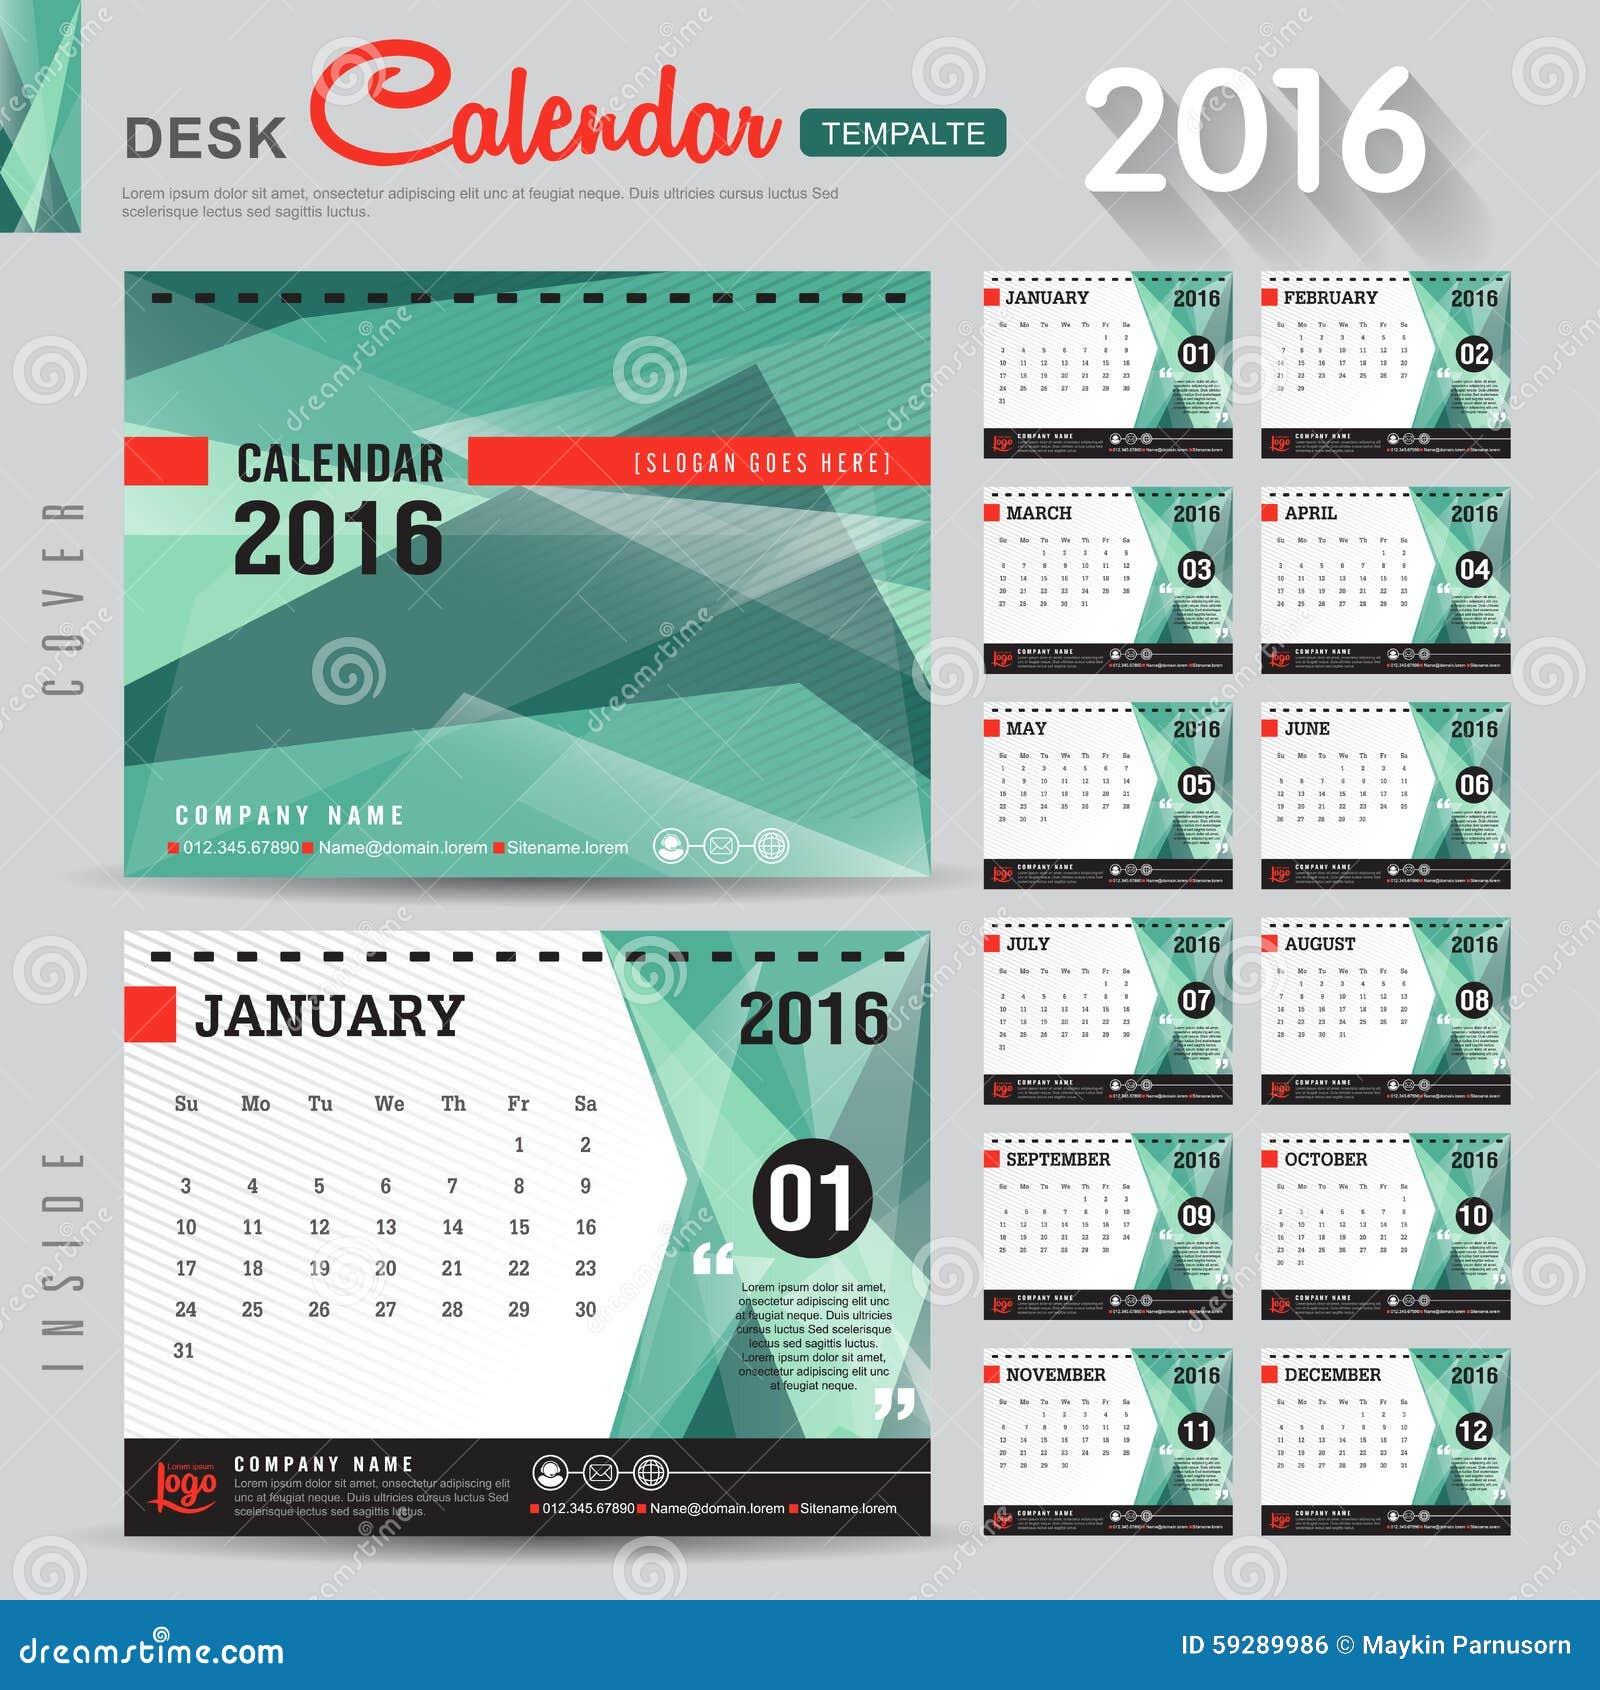 Table Calendar Design Samples : Calendar stock vector image of company august